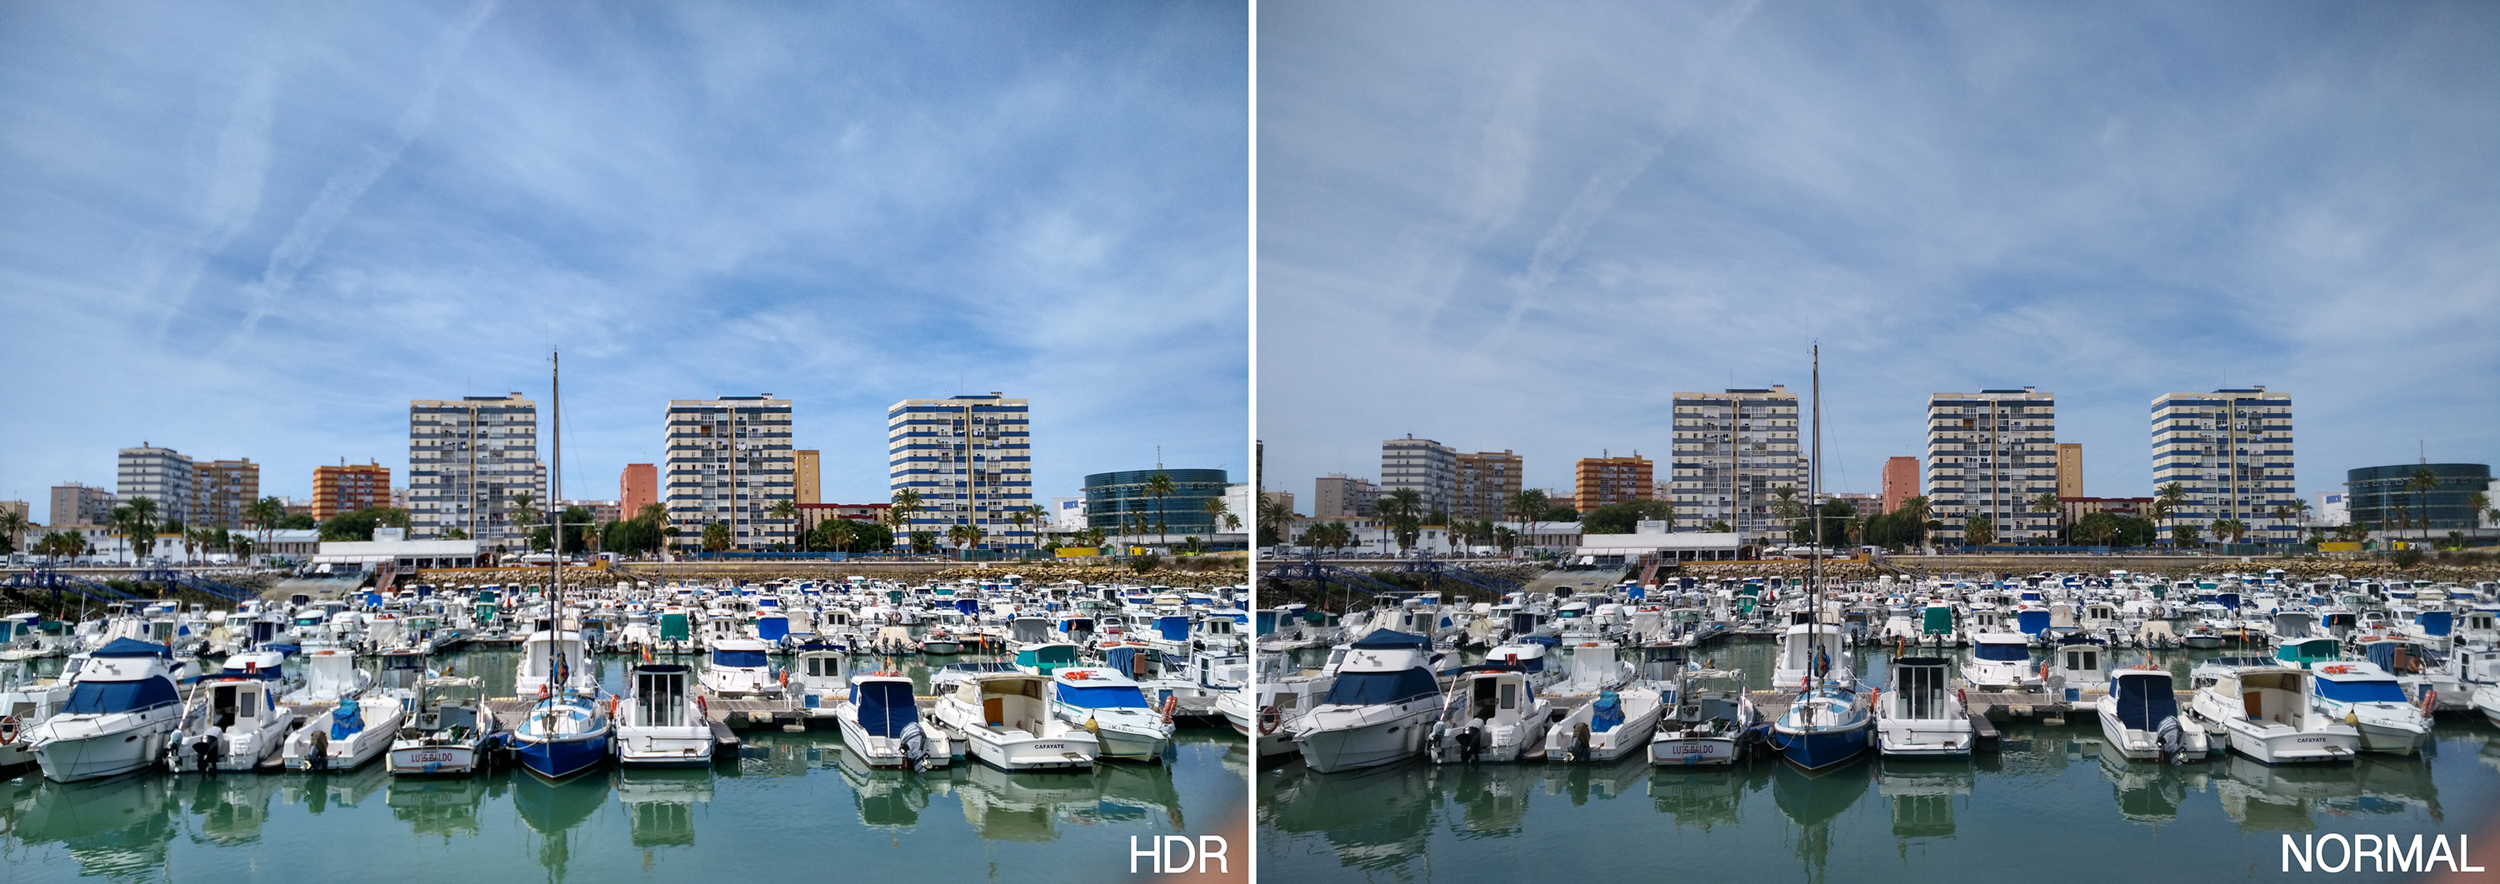 Foto de HDR (1/1)